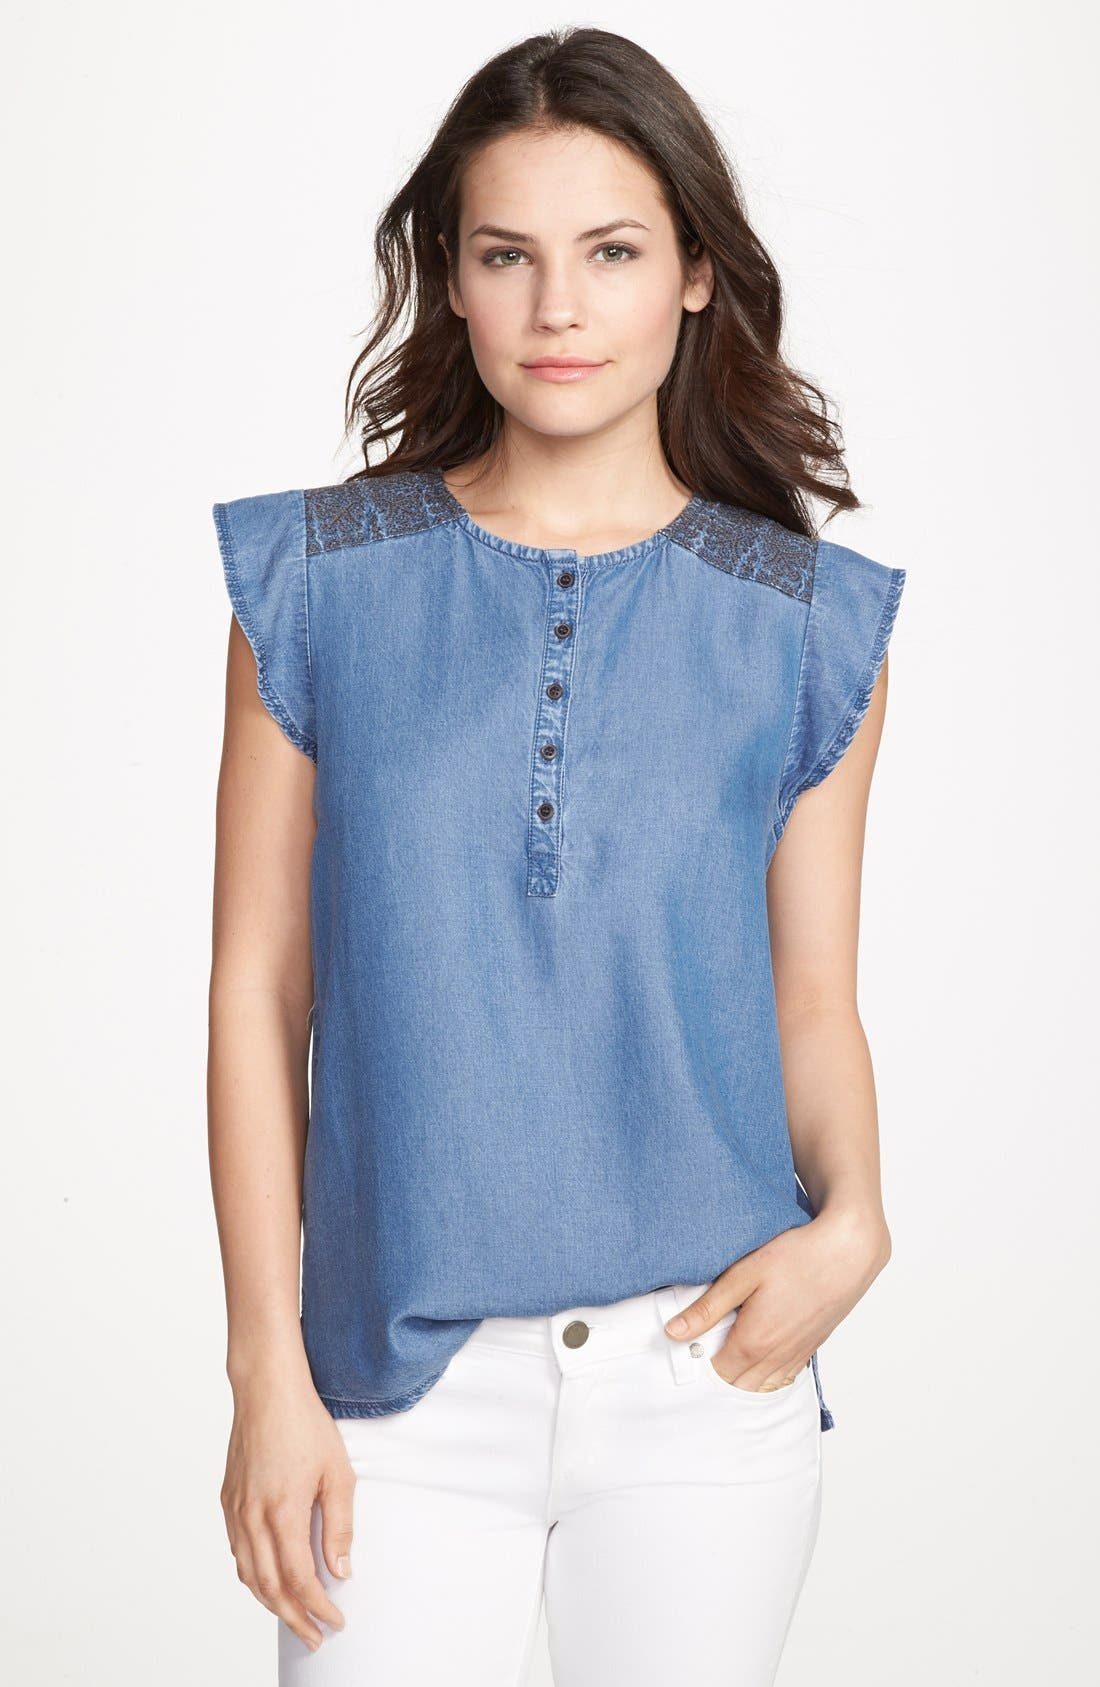 Alternate Image 1 Selected - Hinge® Embroidered Denim Top